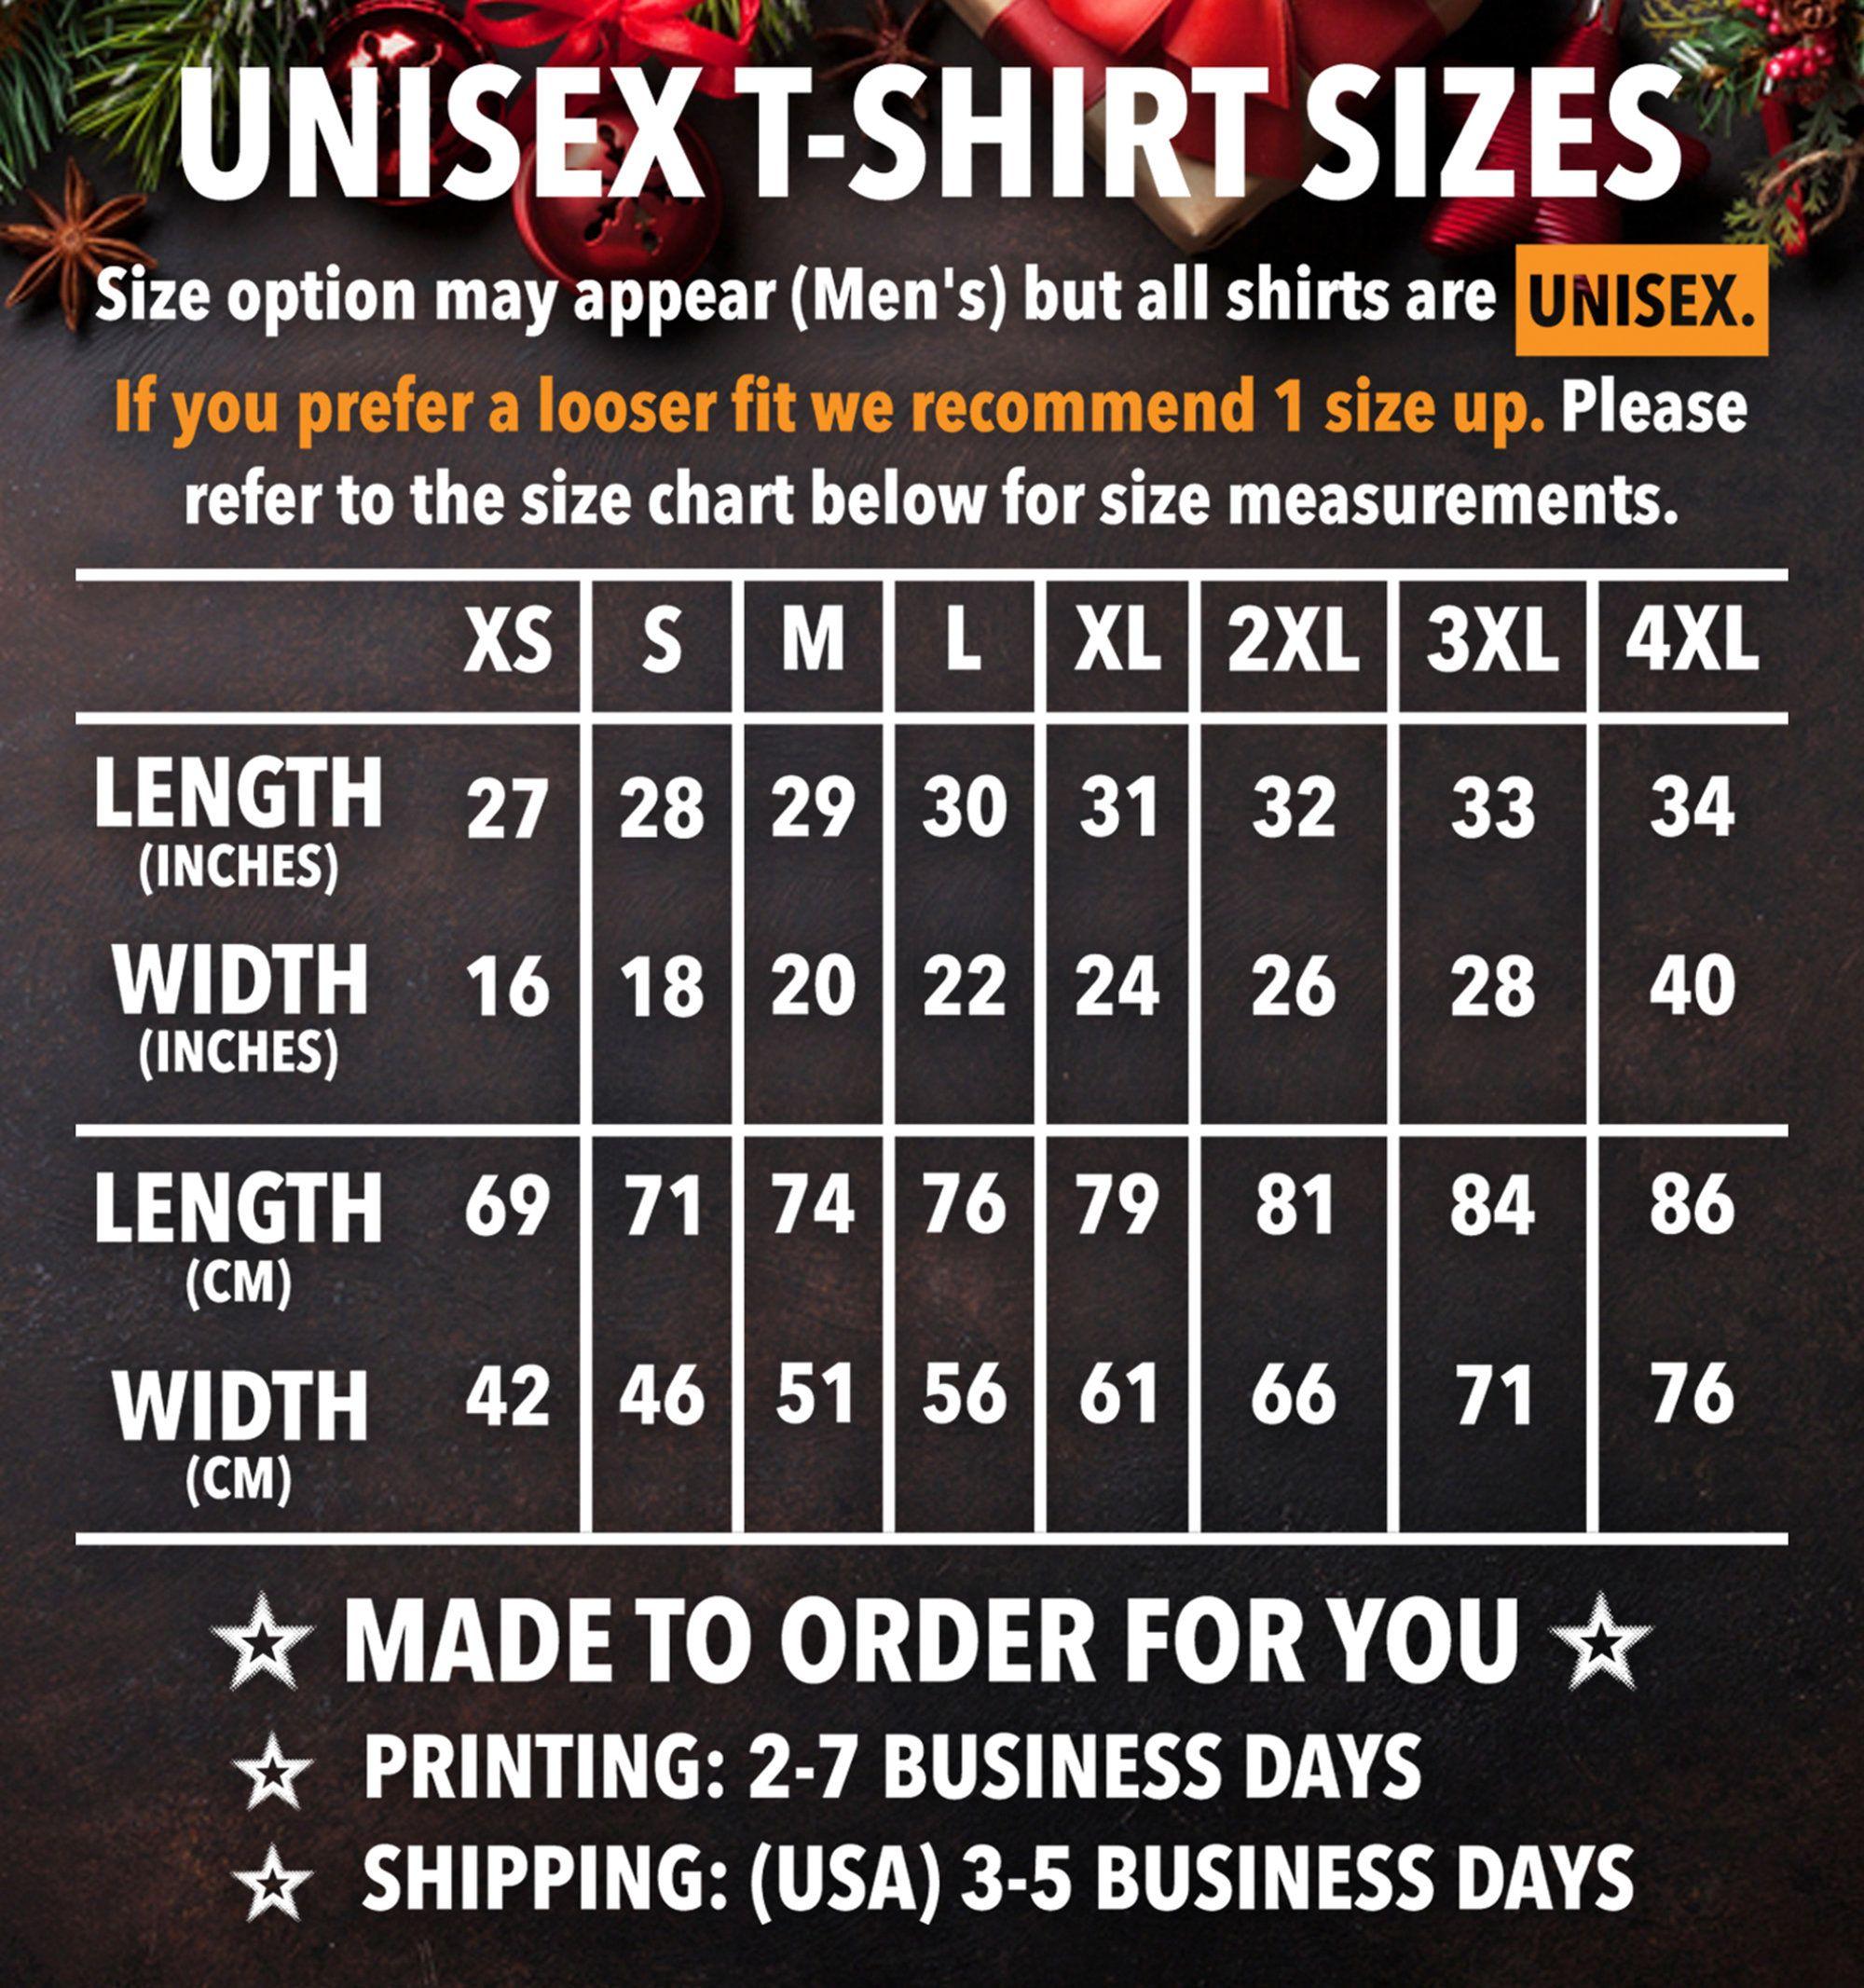 Yorkie Mom Unisex Shirt - Yorkie Shirt, Yorkie Gifts, Yorkie Lover, Yorkshire Terrier, Yorkshire Terrier Shirt, Yorkie Mama Shirt, Dog Mom